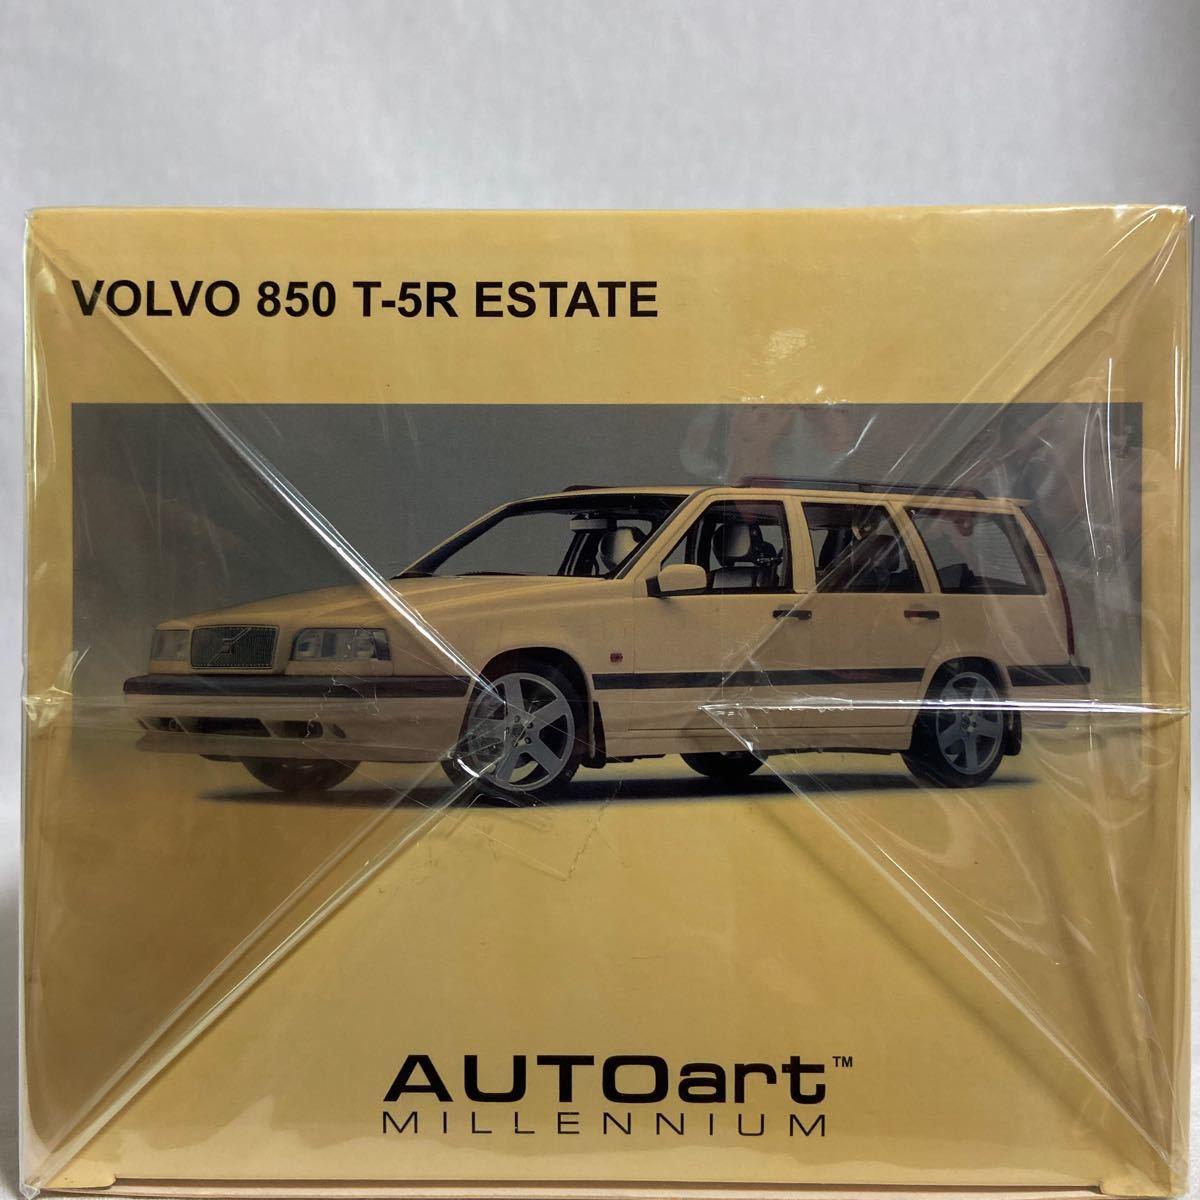 AUTOart 1/18 VOLVO 850 T-5R ESTATE 1995 オートアート ボルボ エステート クリームイエロー Aa 絶版 ミニカー 旧車 ワゴン モデルカー